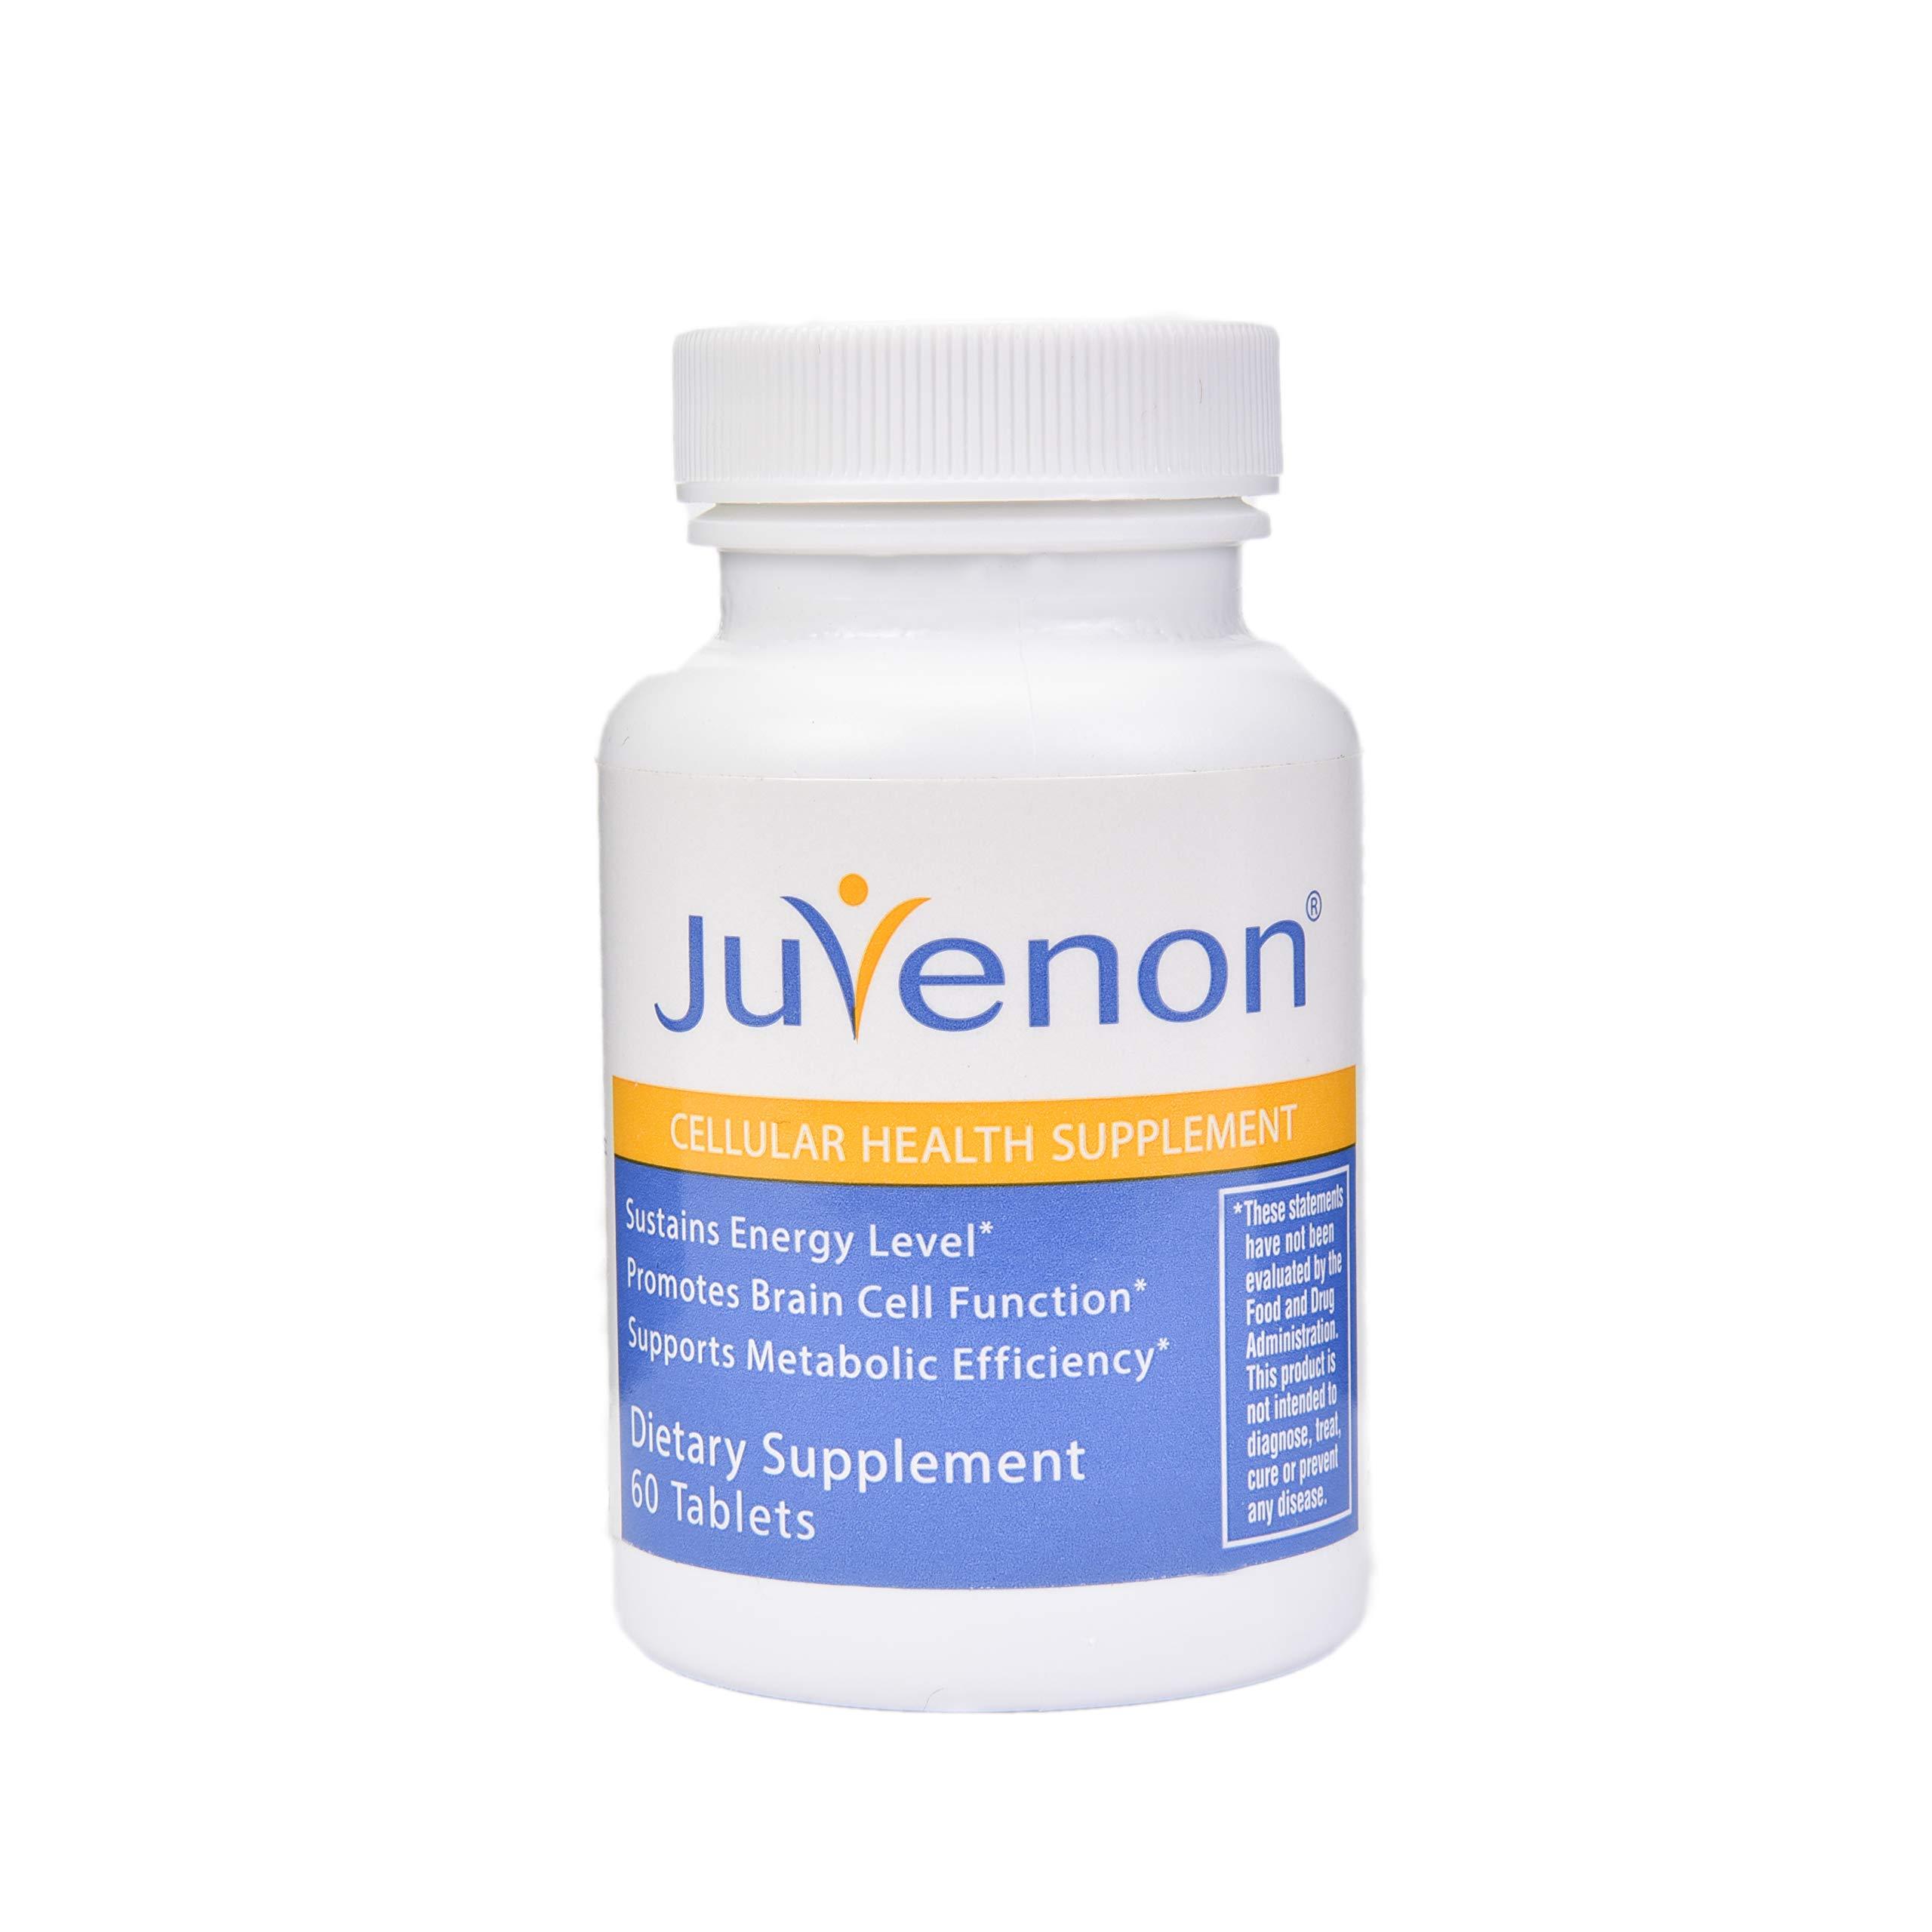 Juvenon Tablets